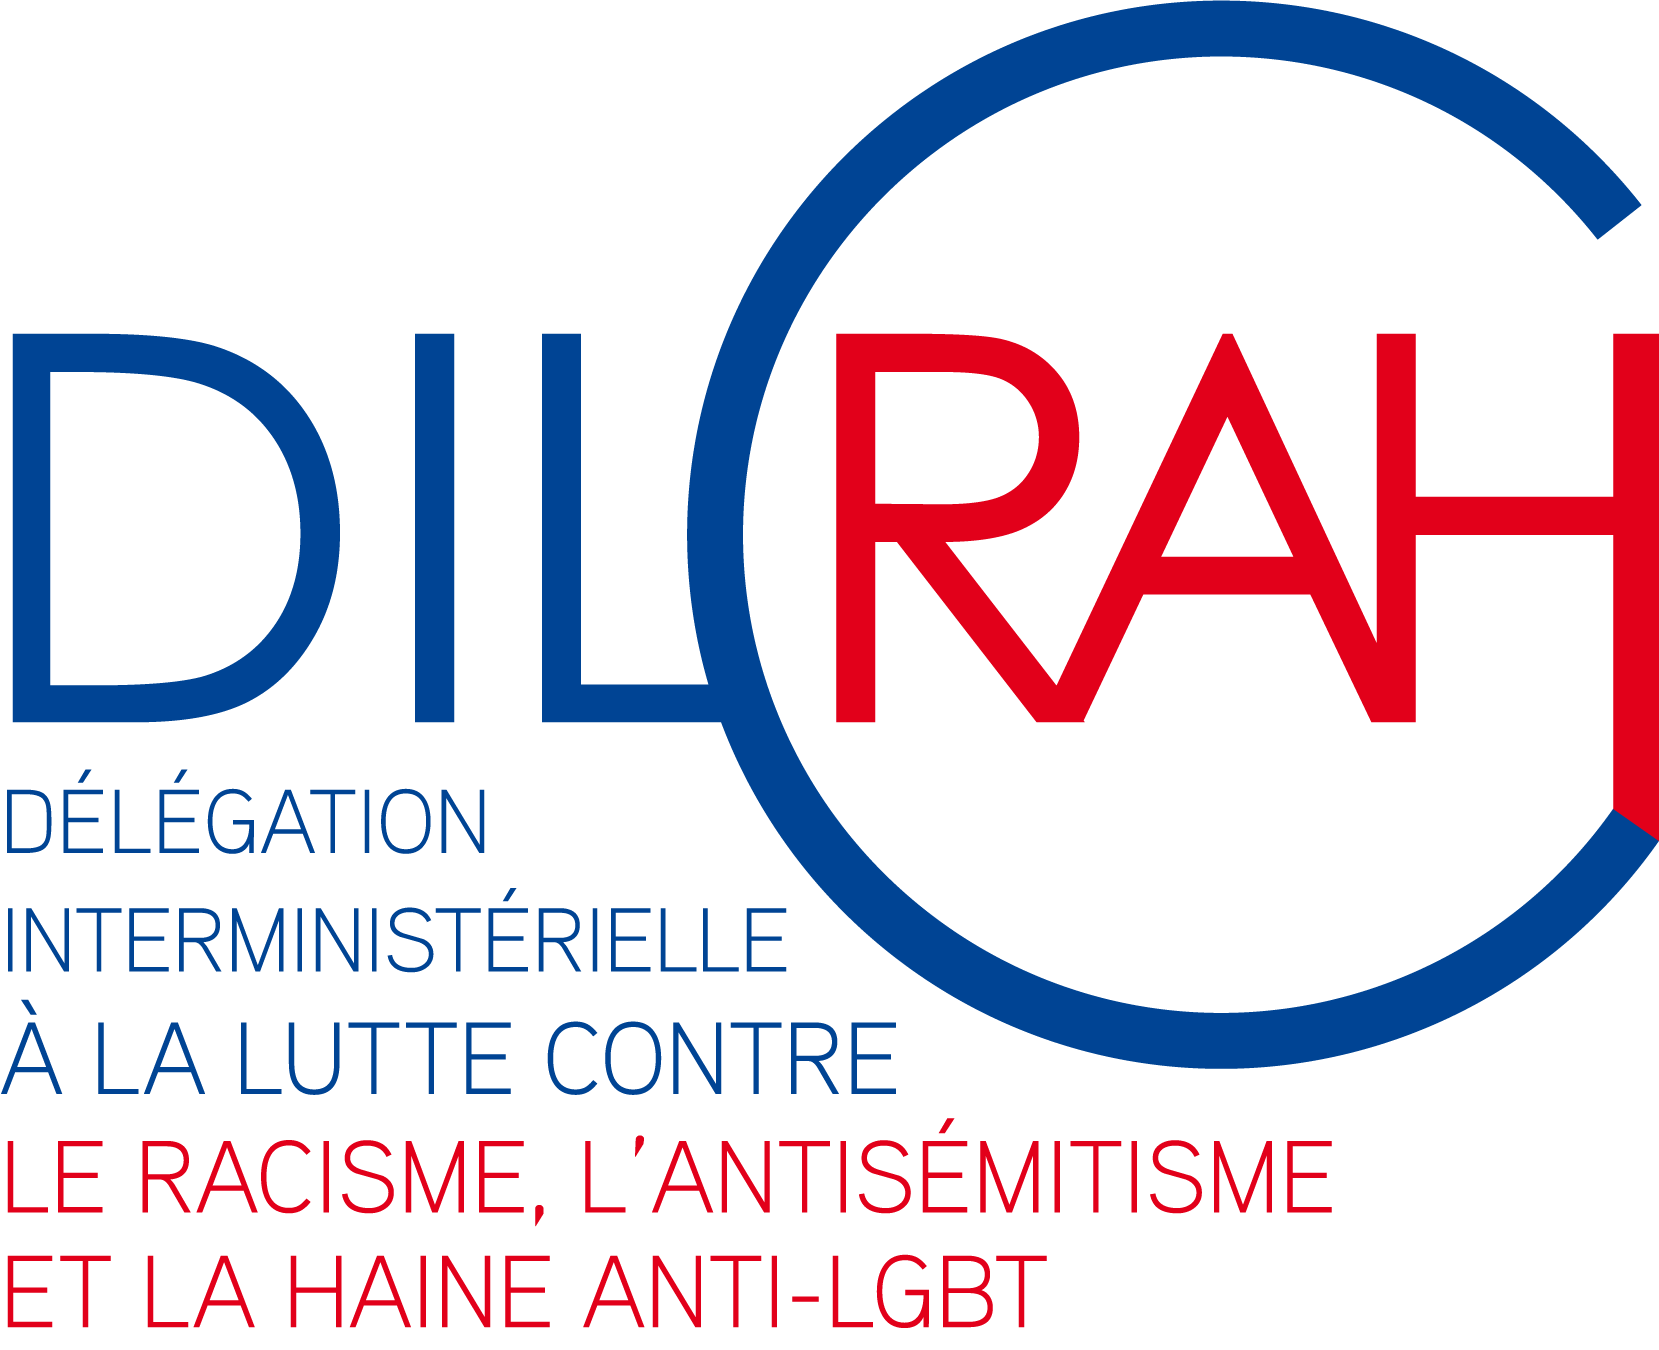 logo-DILCRA-typo-2017